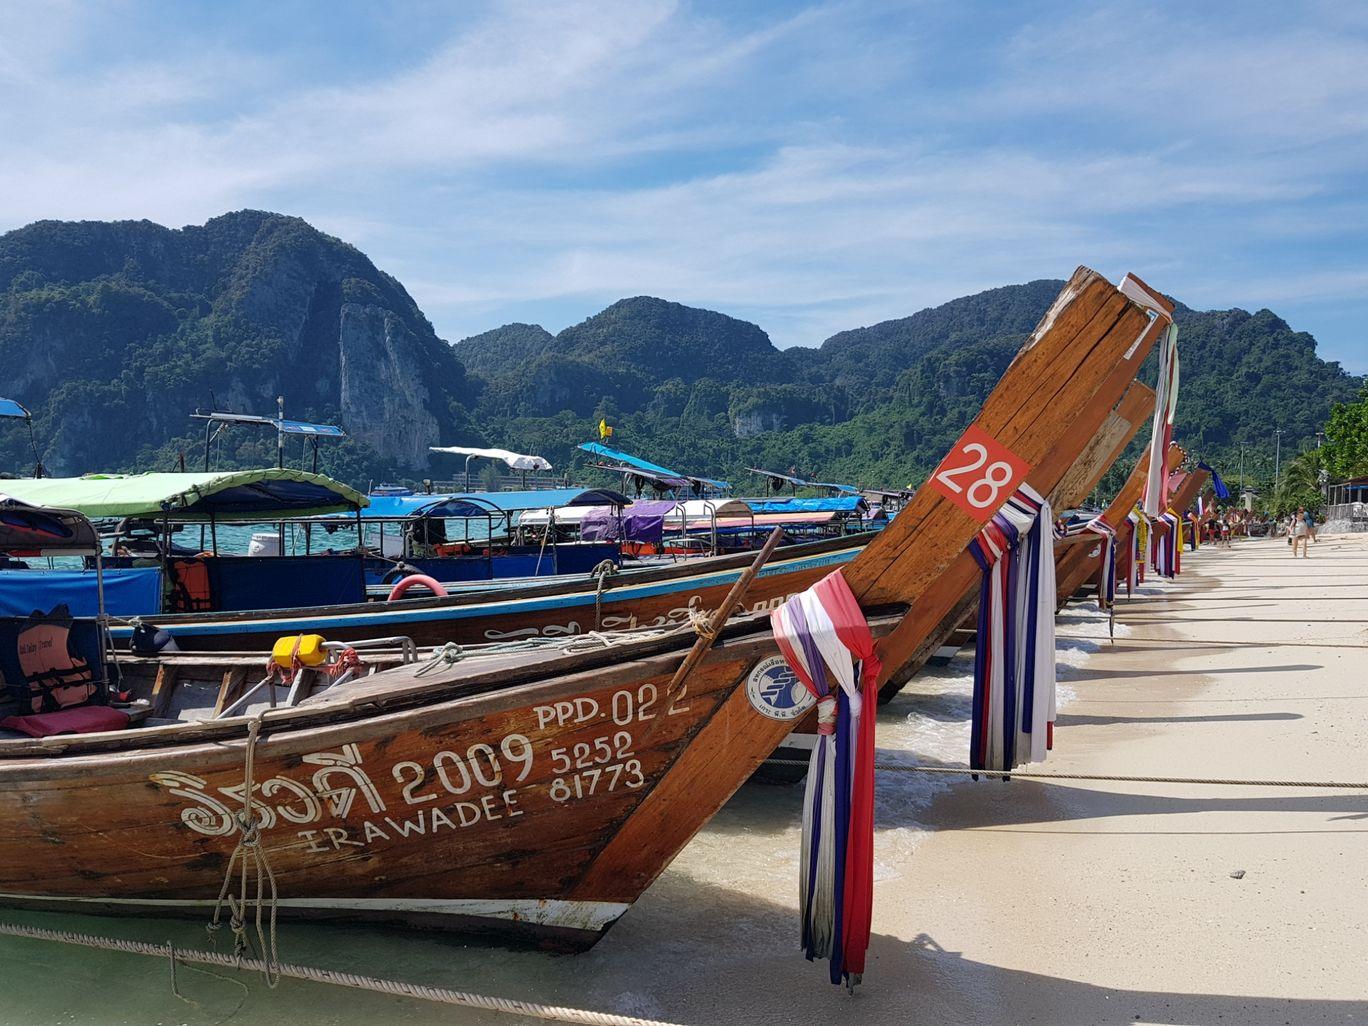 Photo of Phi Phi Island Tour Speed Boat Tour By Vishruta Chopra